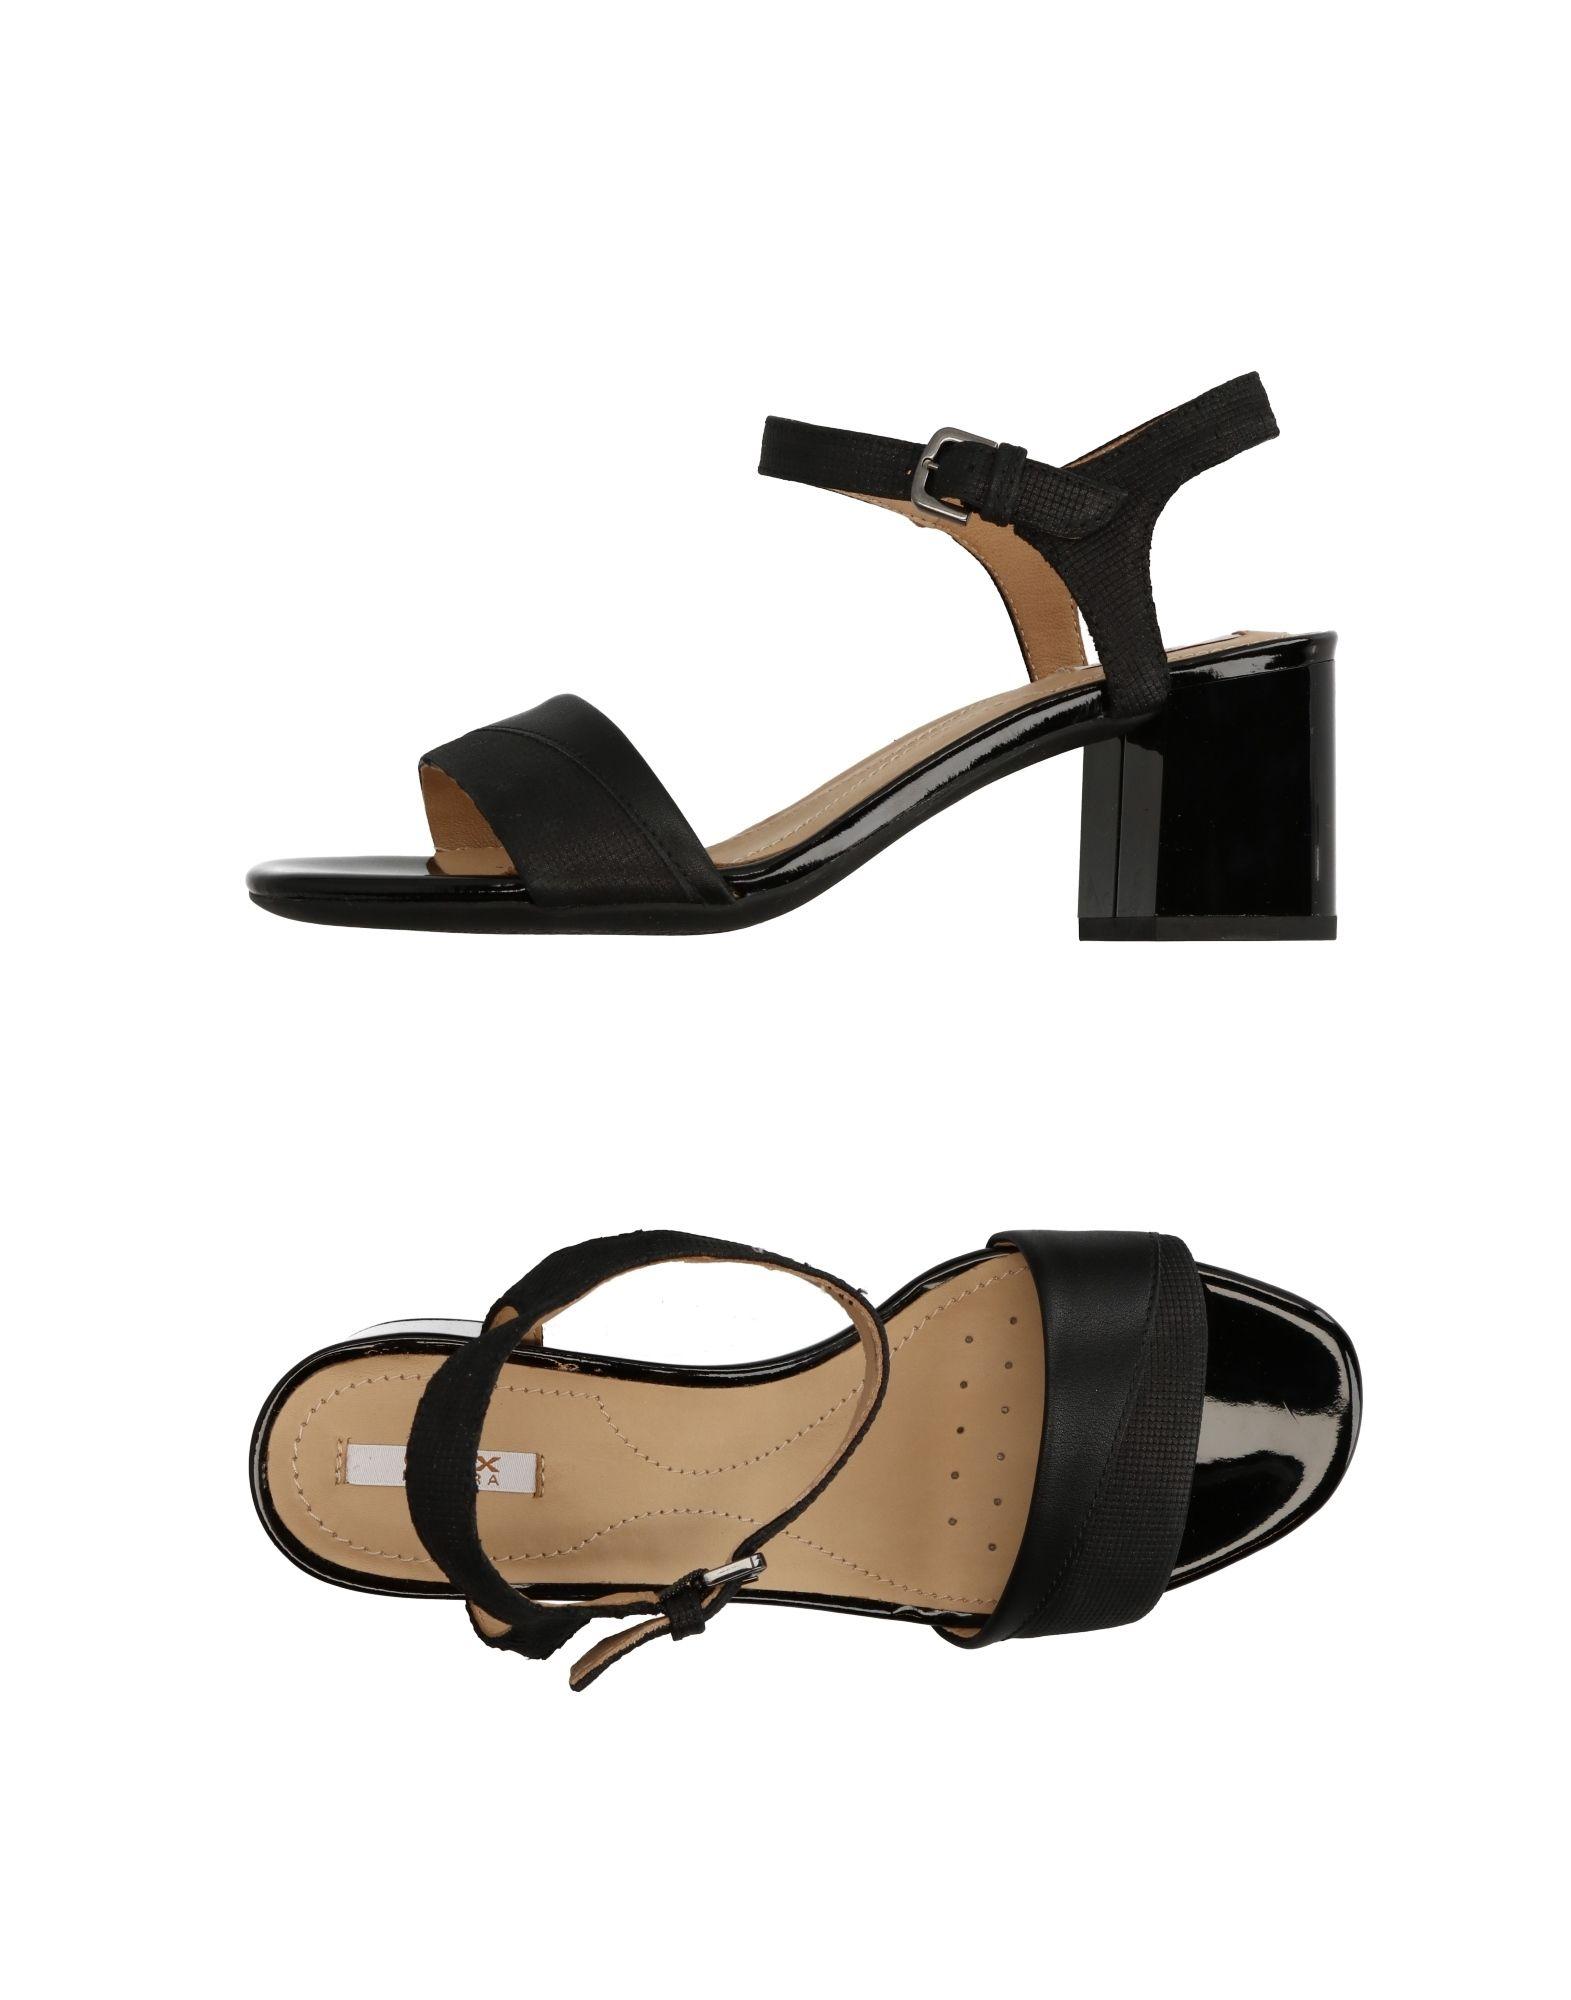 Geox Sandalen Damen  11256850LR Gute Qualität beliebte Schuhe